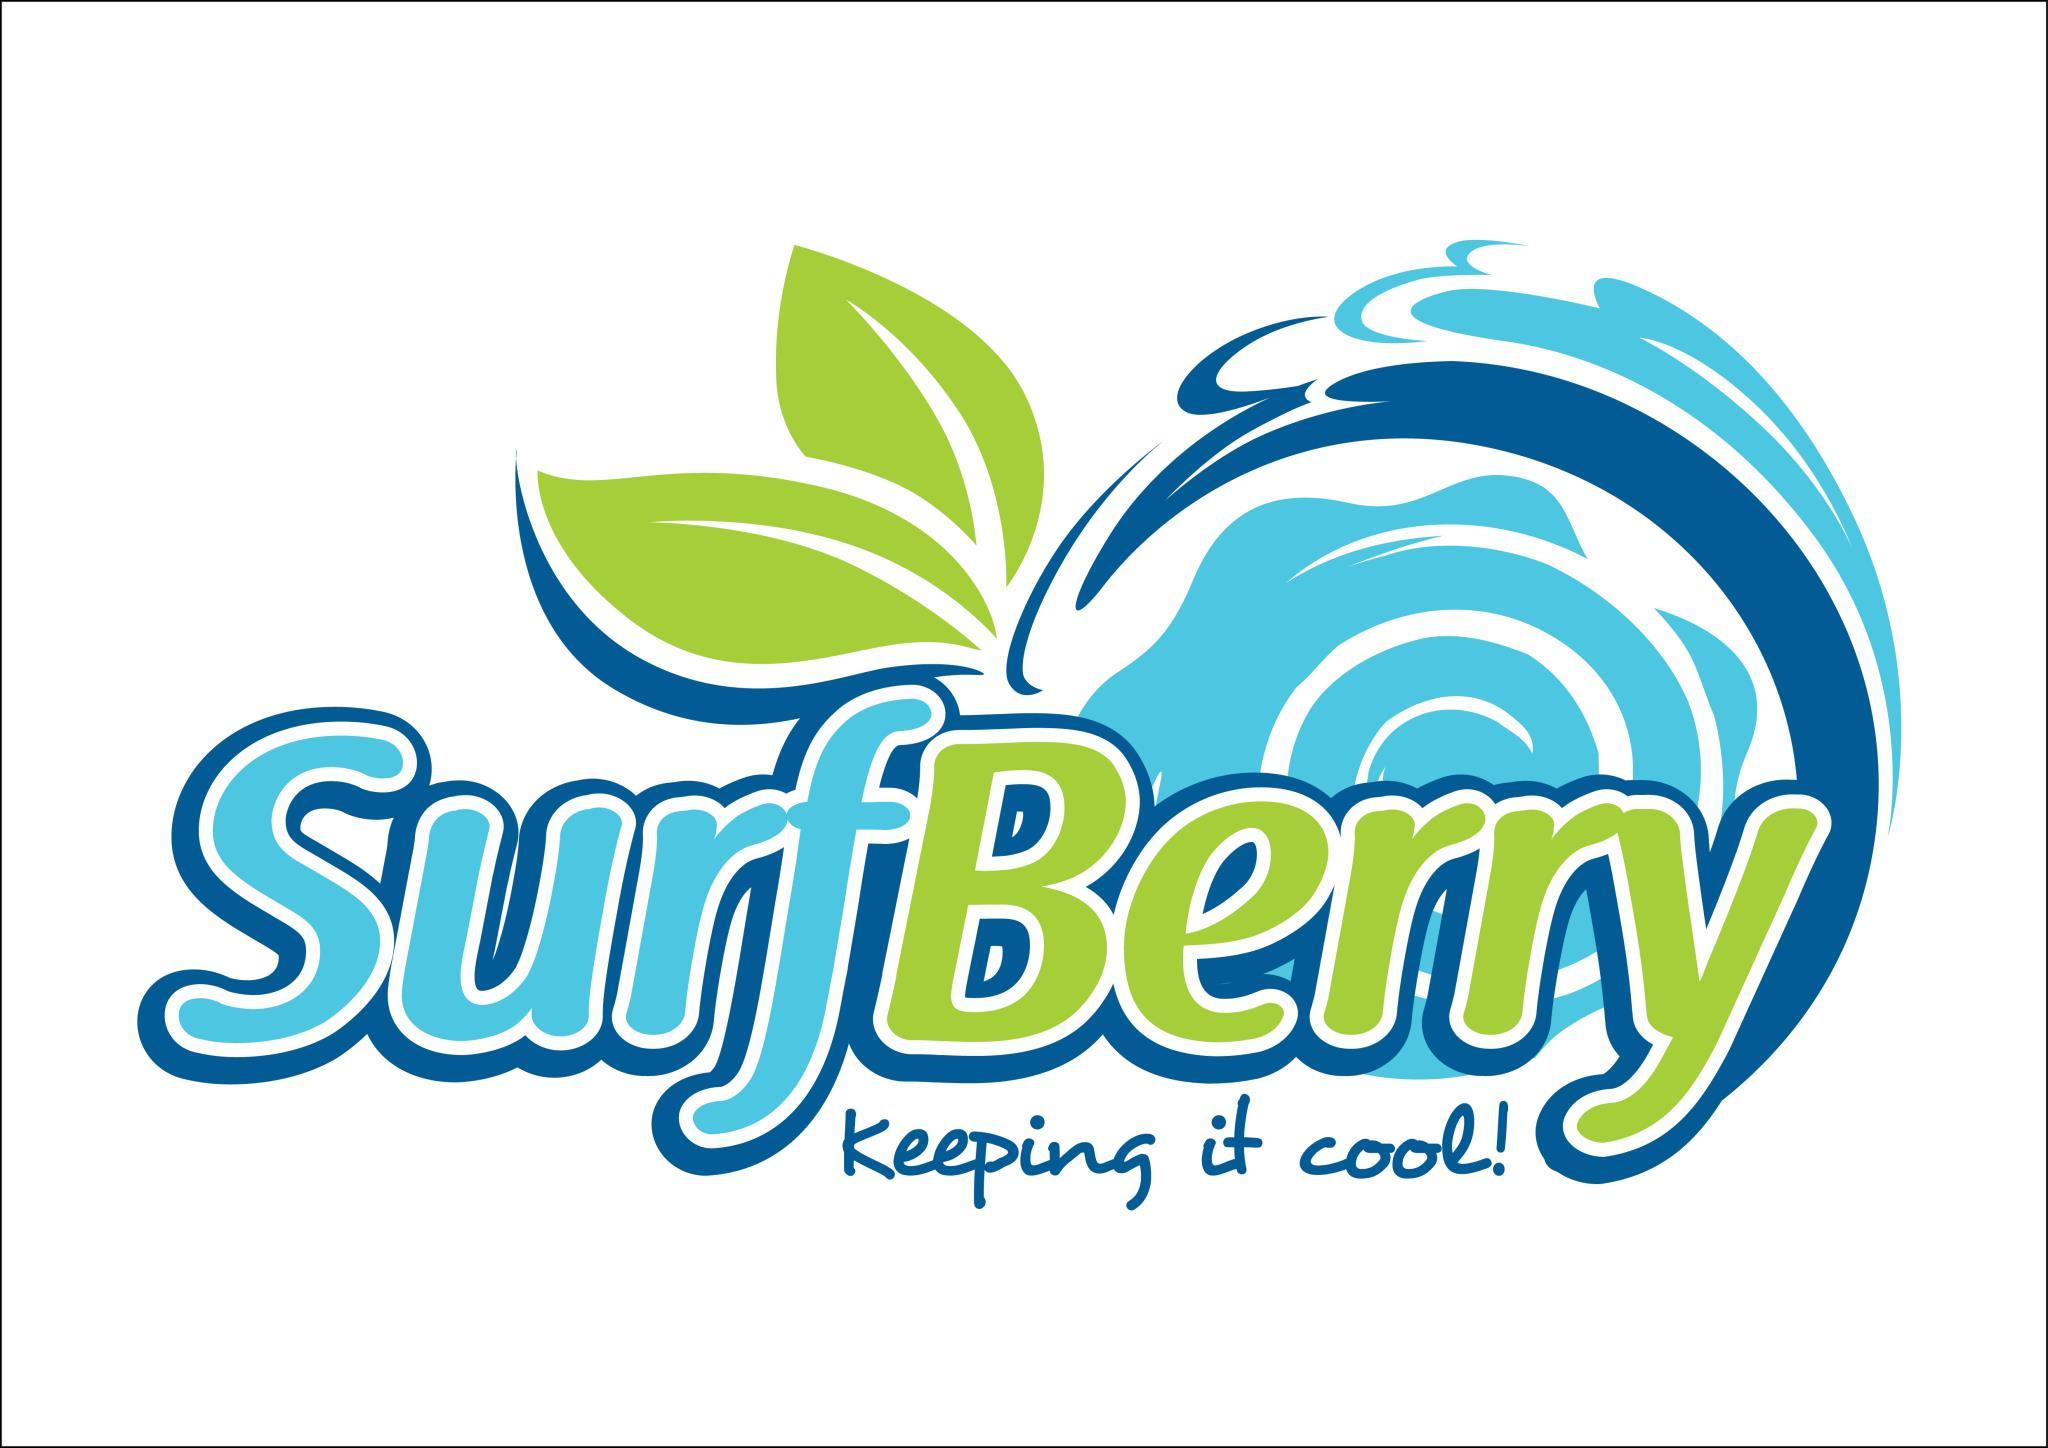 SurfBerry.jpg